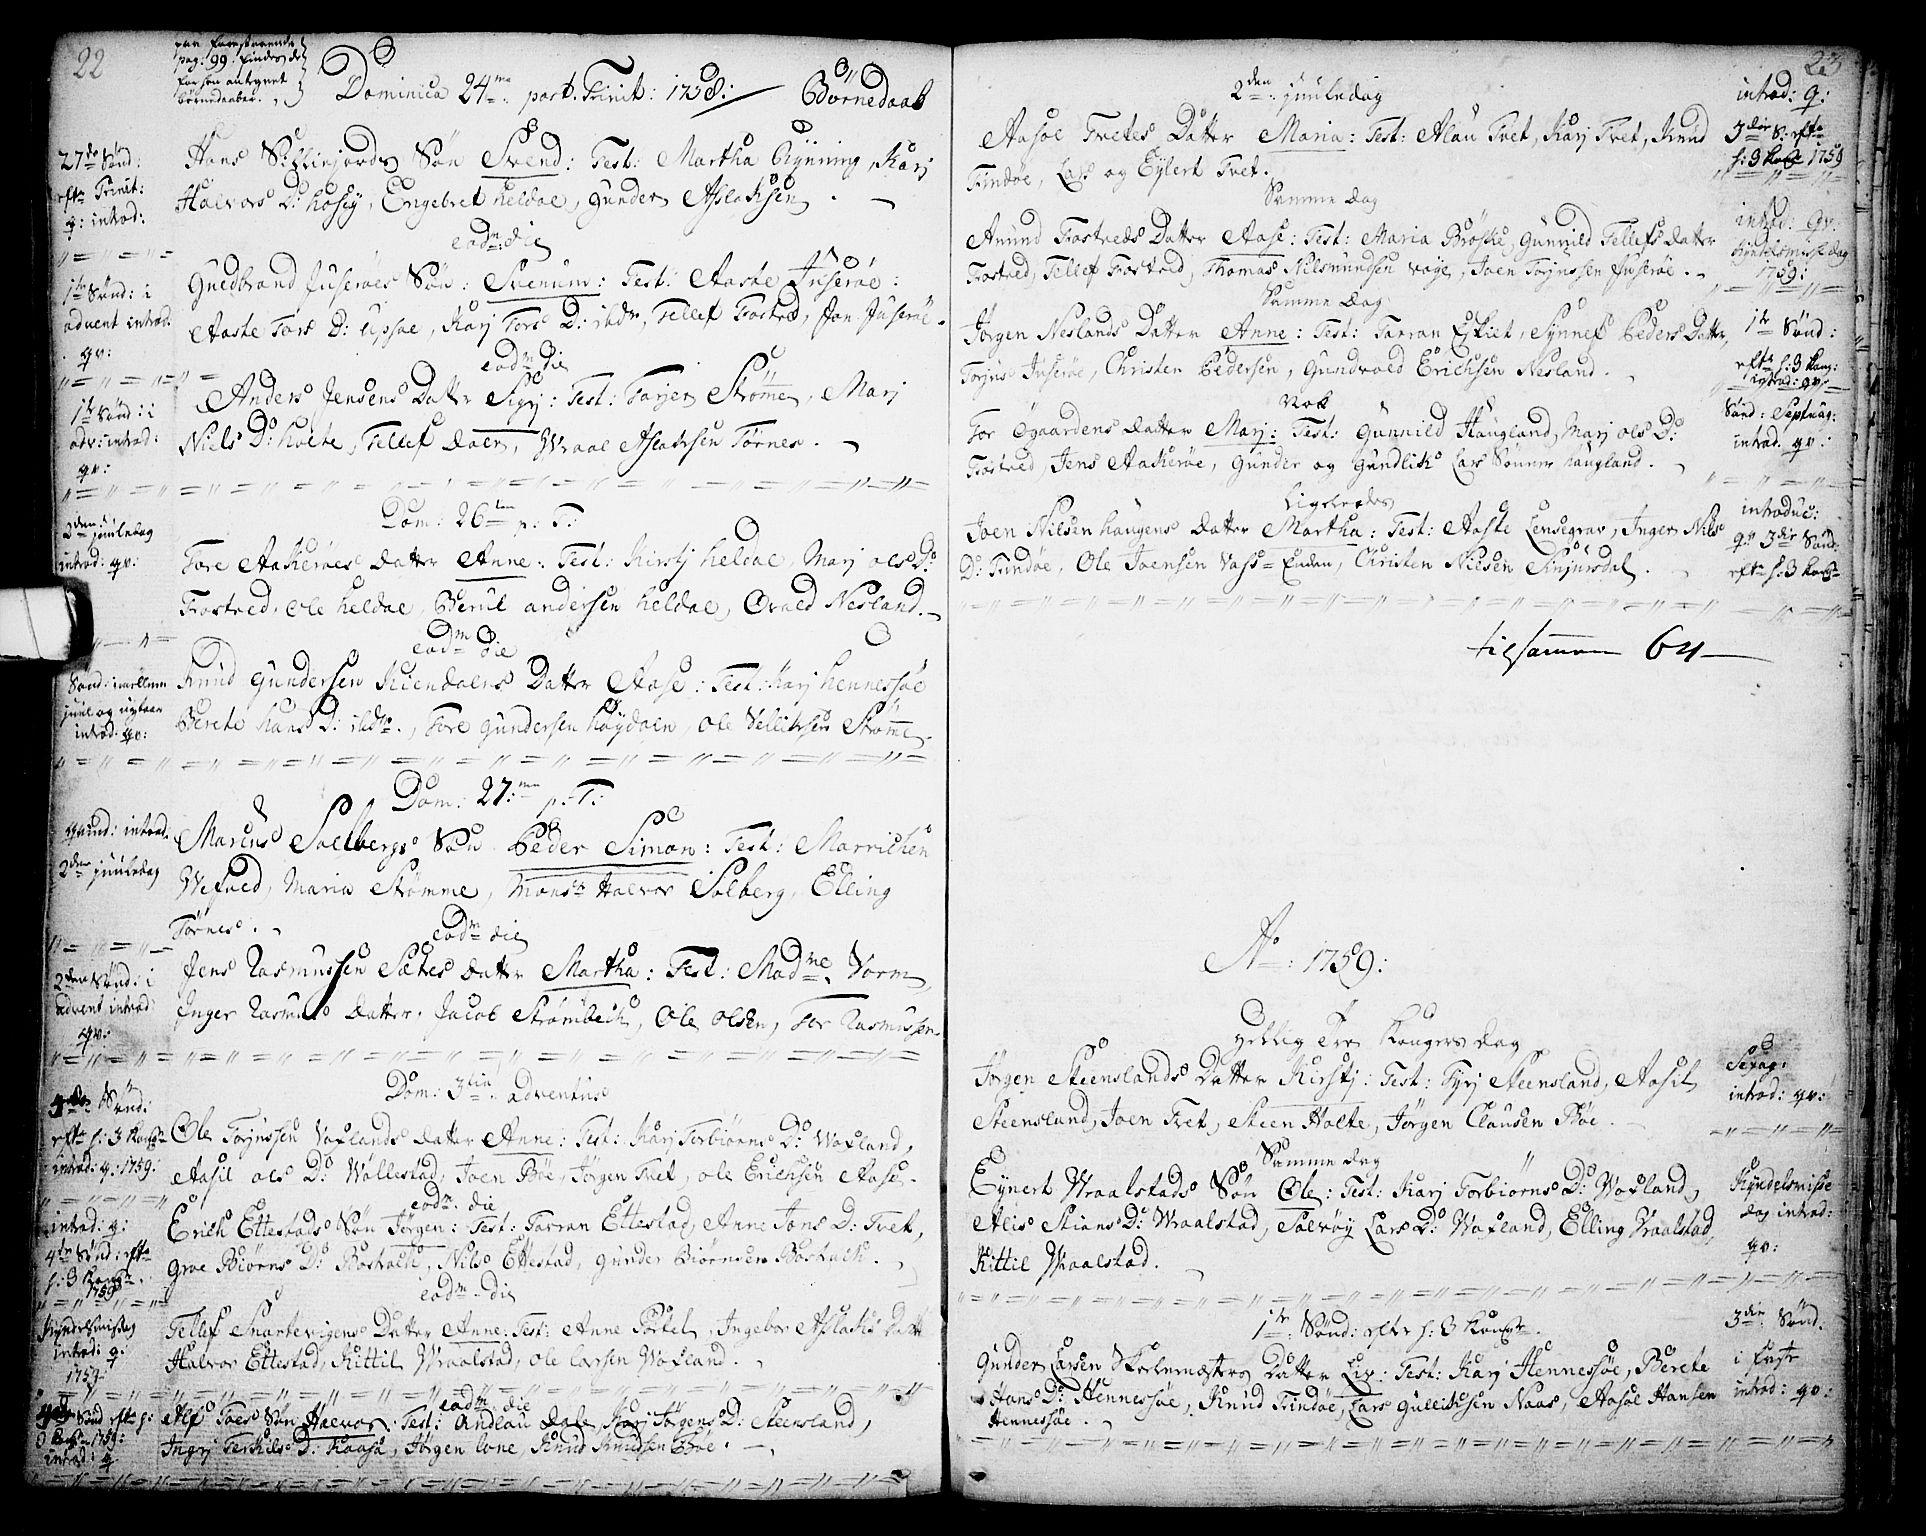 SAKO, Drangedal kirkebøker, F/Fa/L0001: Ministerialbok nr. 1, 1697-1767, s. 22-23